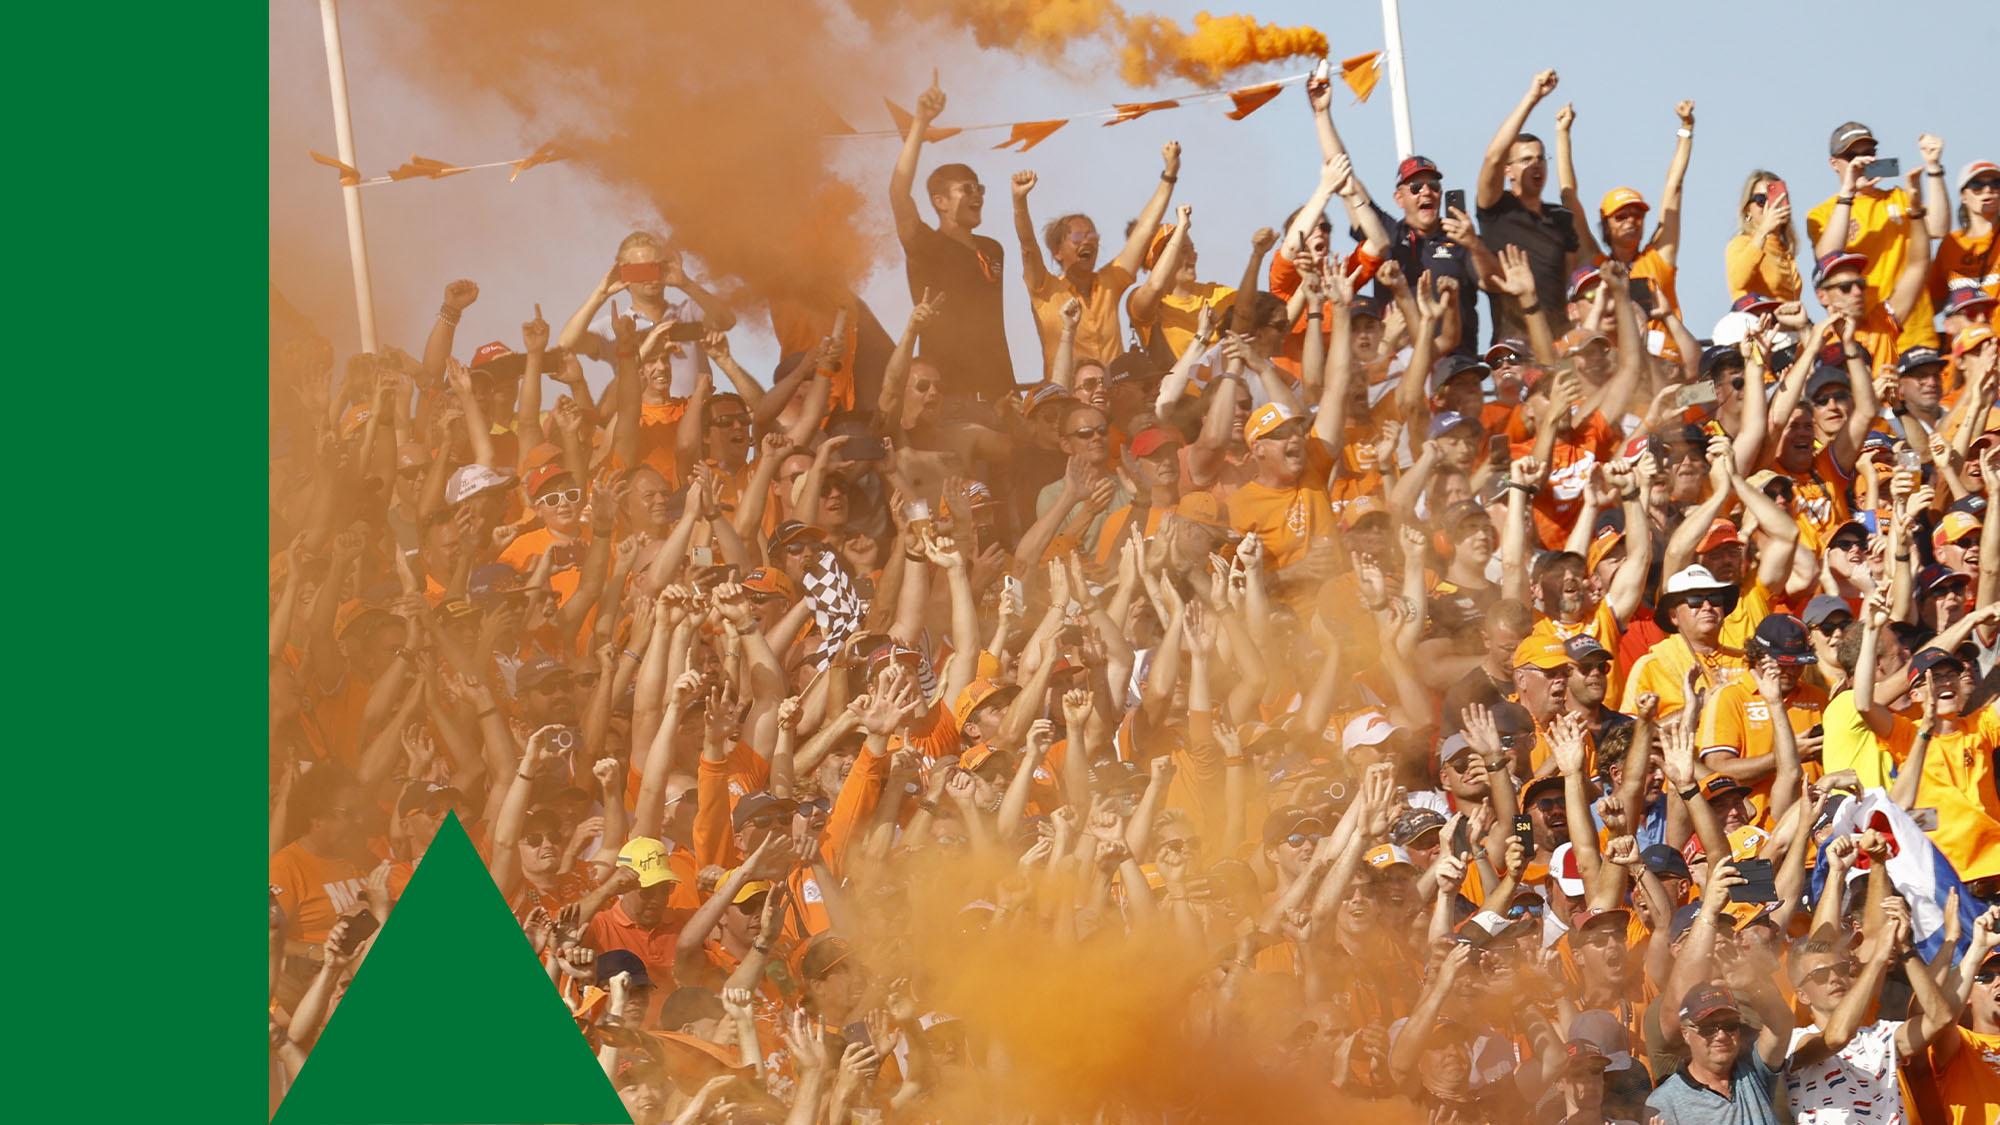 ZANDVOORT- Fans celebrate after the Dutch Grand Prix won by Max Verstappen at the Zandvoort circuit. ANP VINCENT JANNINK (Photo by ANP Sport via Getty Images)